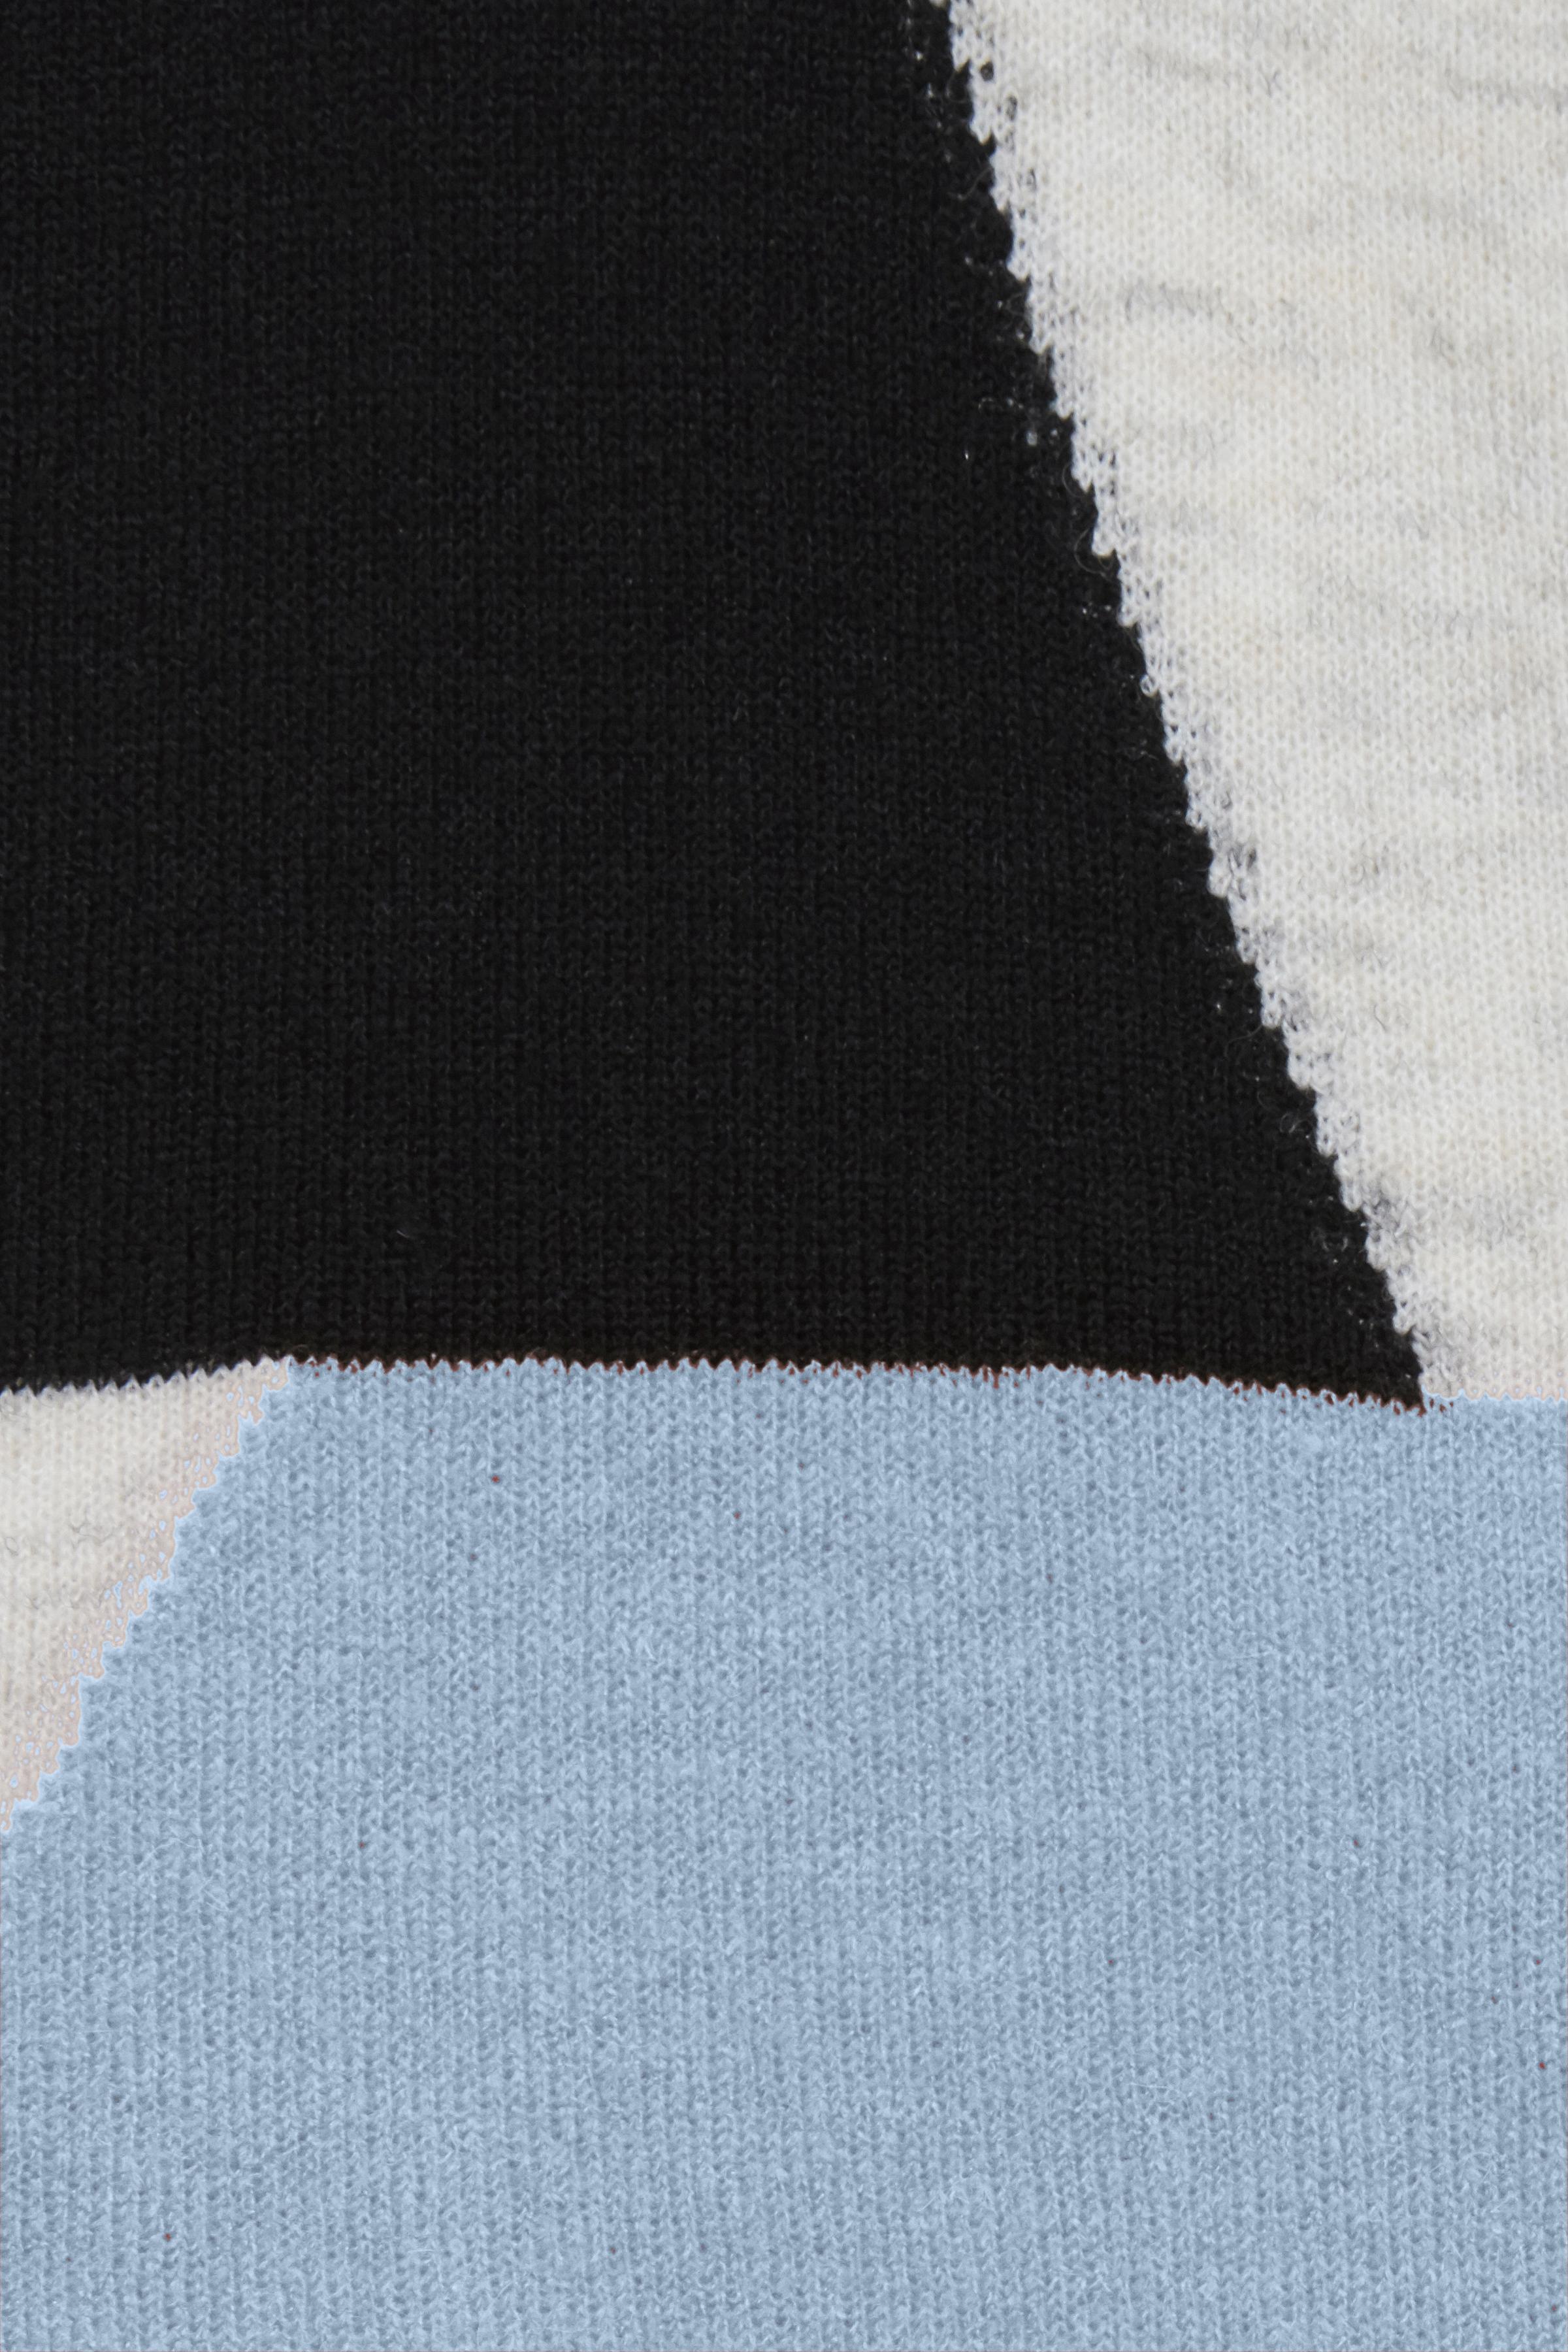 Placid Blue melange Strikpullover fra Fransa – Køb Placid Blue melange Strikpullover fra str. XS-XXL her